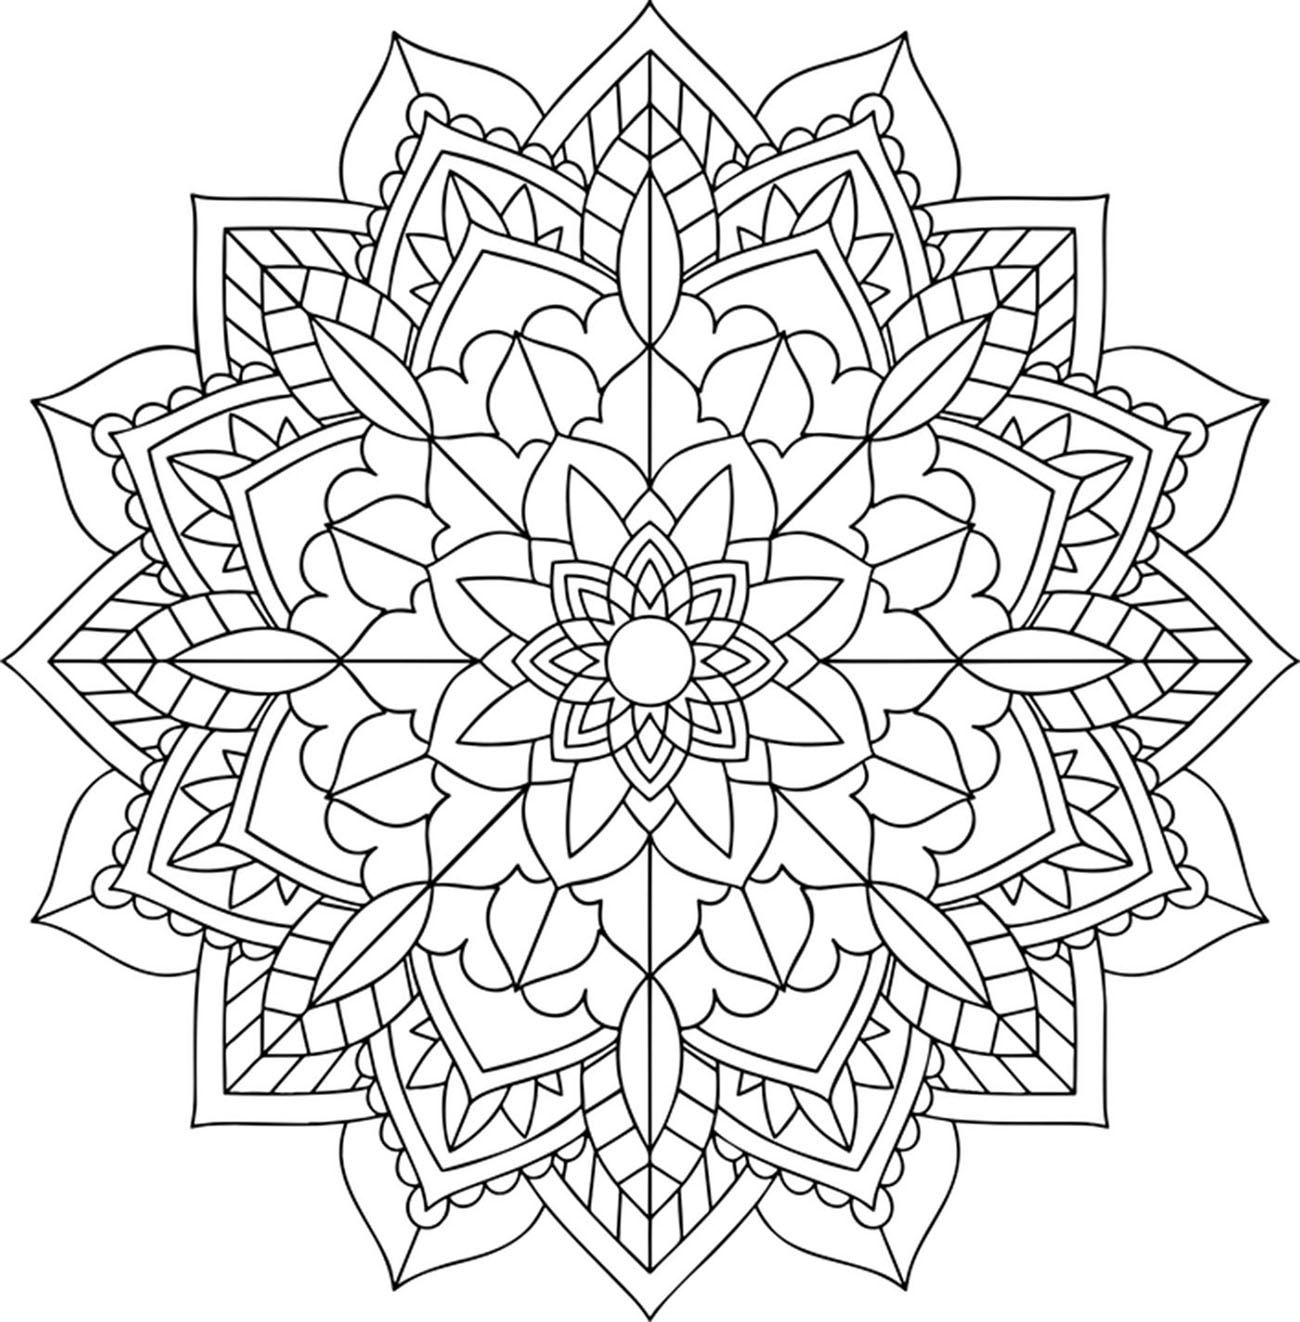 Floral and harmonious Mandala   Prepare your most beautiful colors ...